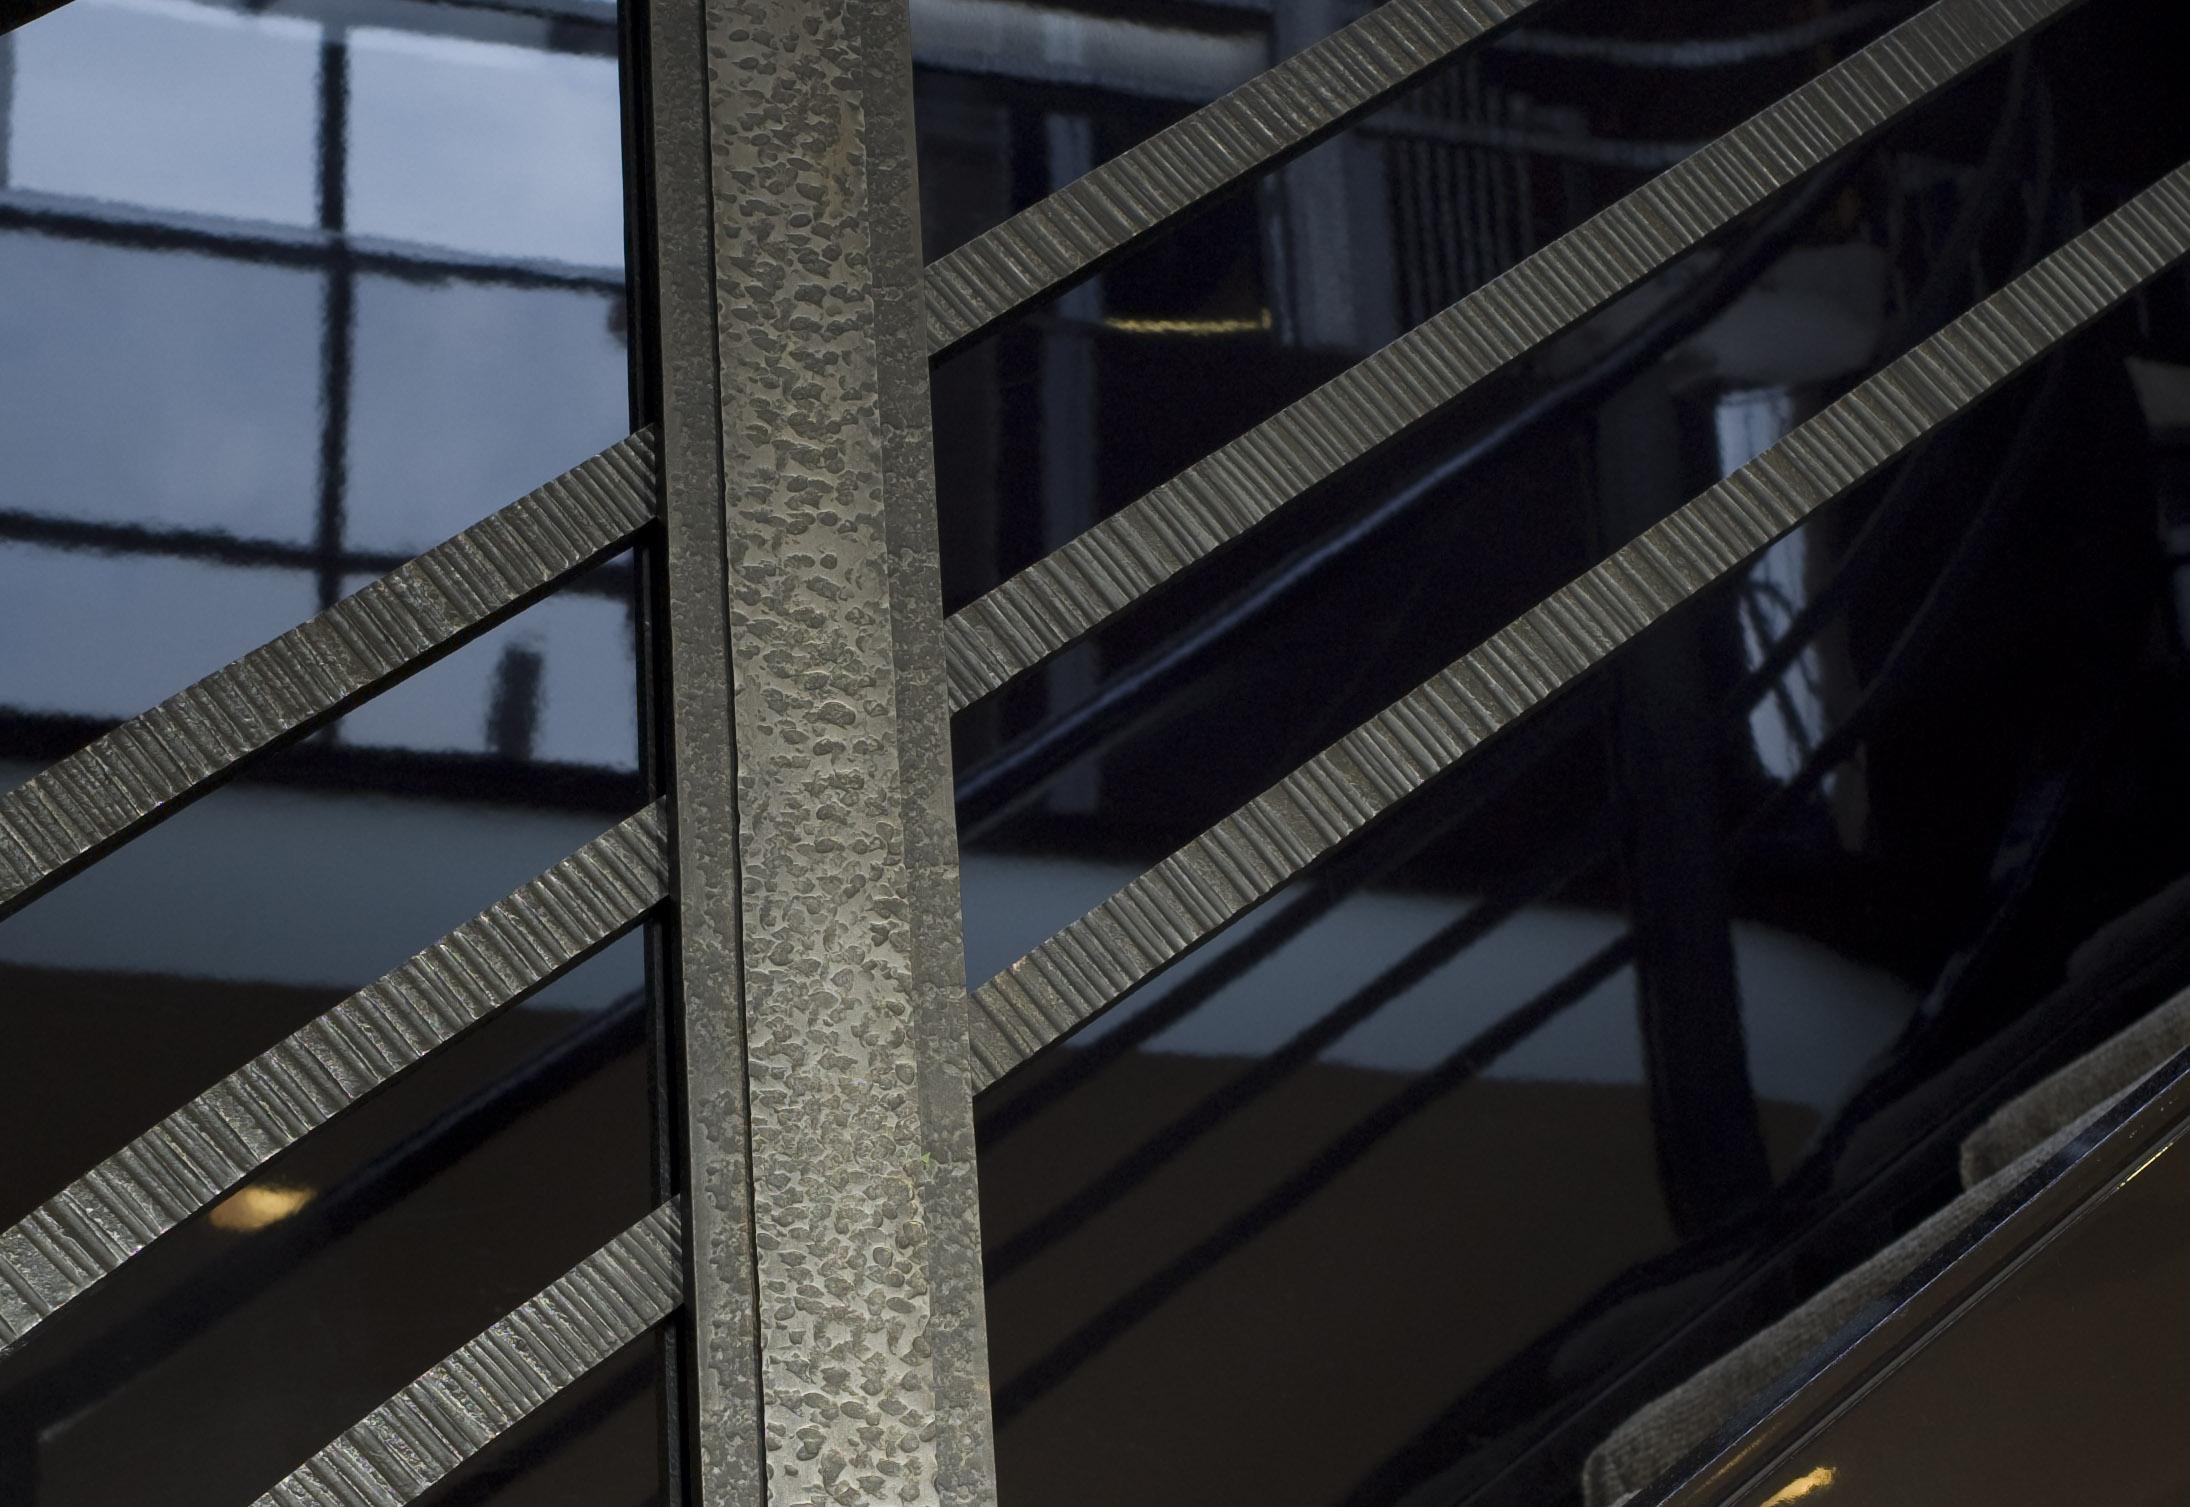 Wrought iron railing fabricated by LMC